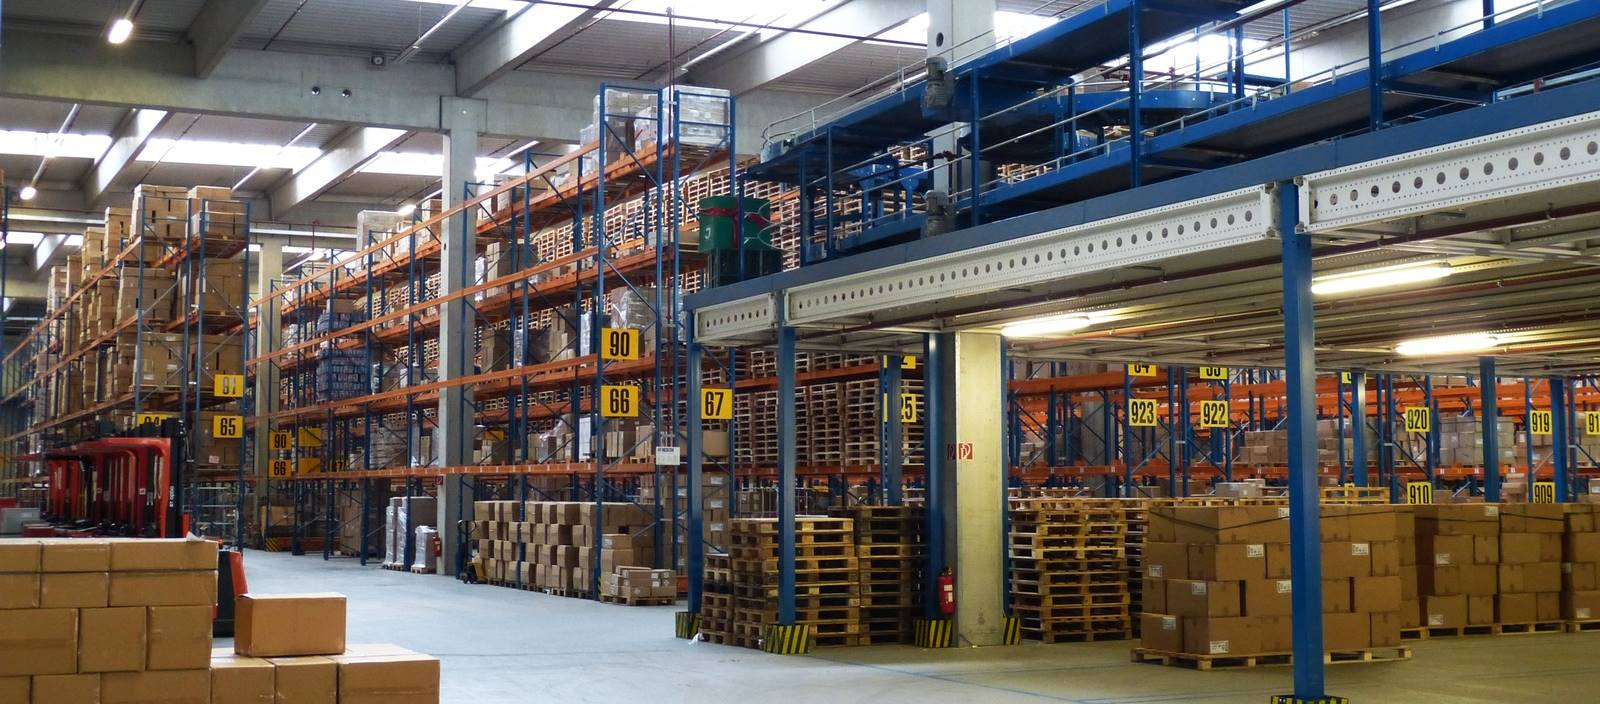 building-transport-factory-shelf-package-warehouse-1292551-pxhere.com-a